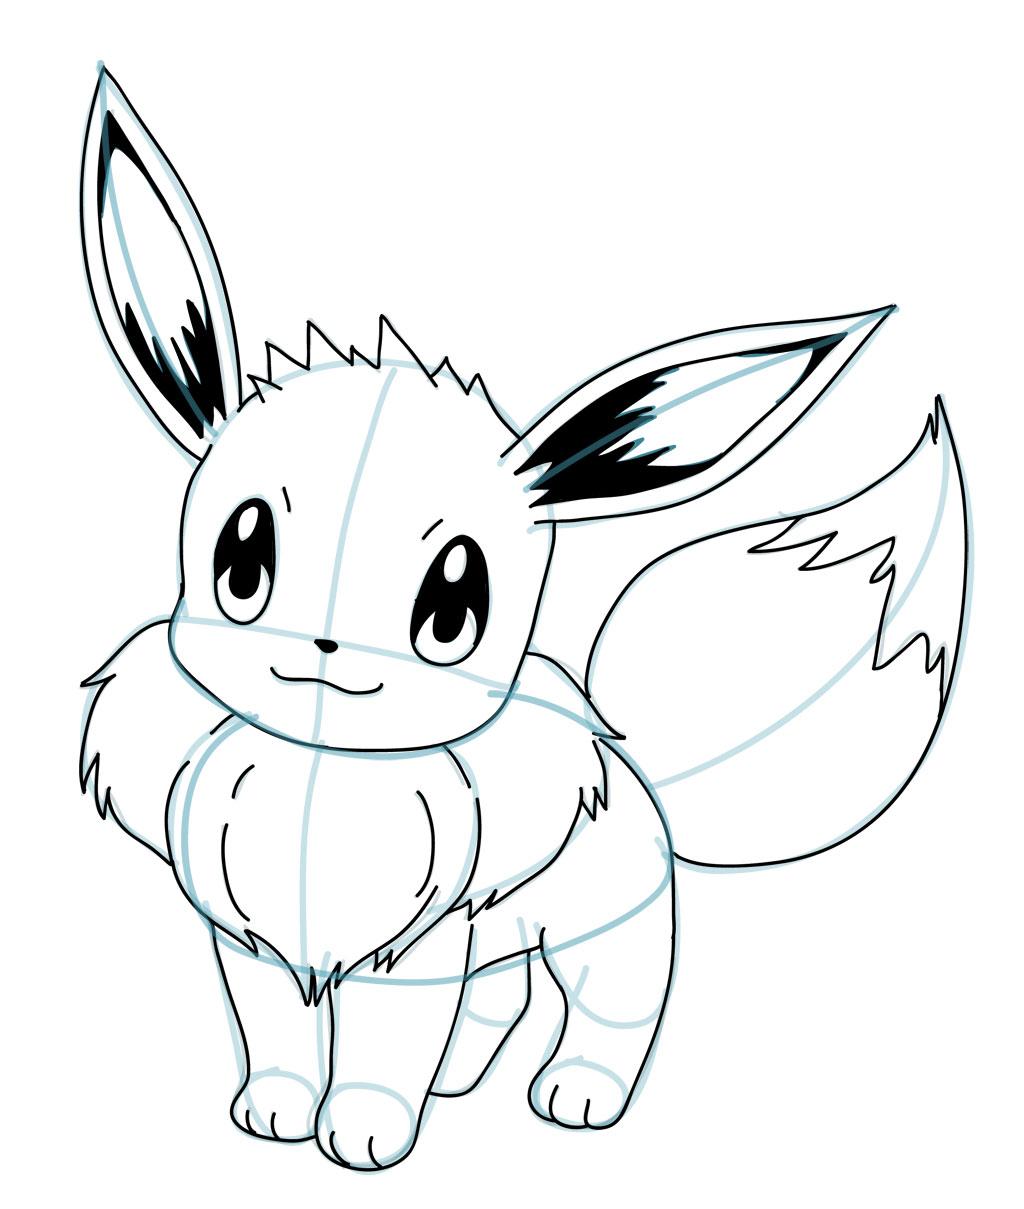 Drawn amd pokemon Pokémon Eevee and Pokemon